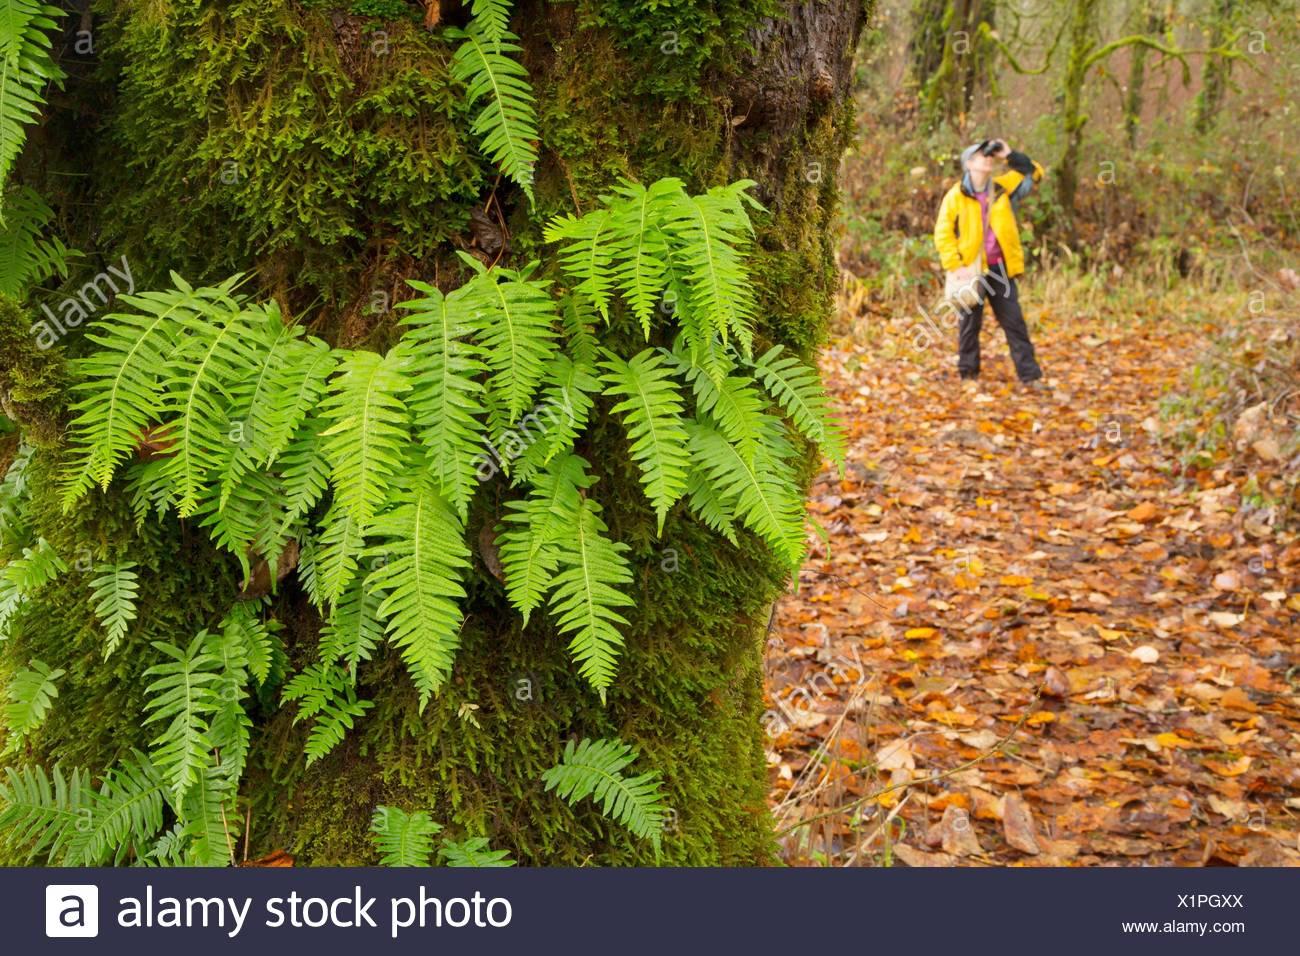 Birder by licorice ferns (Polypodium glycyrrhiza) along Warrior Rock Trail, Sauvie Island Wildlife Area, Oregon. Stock Photo